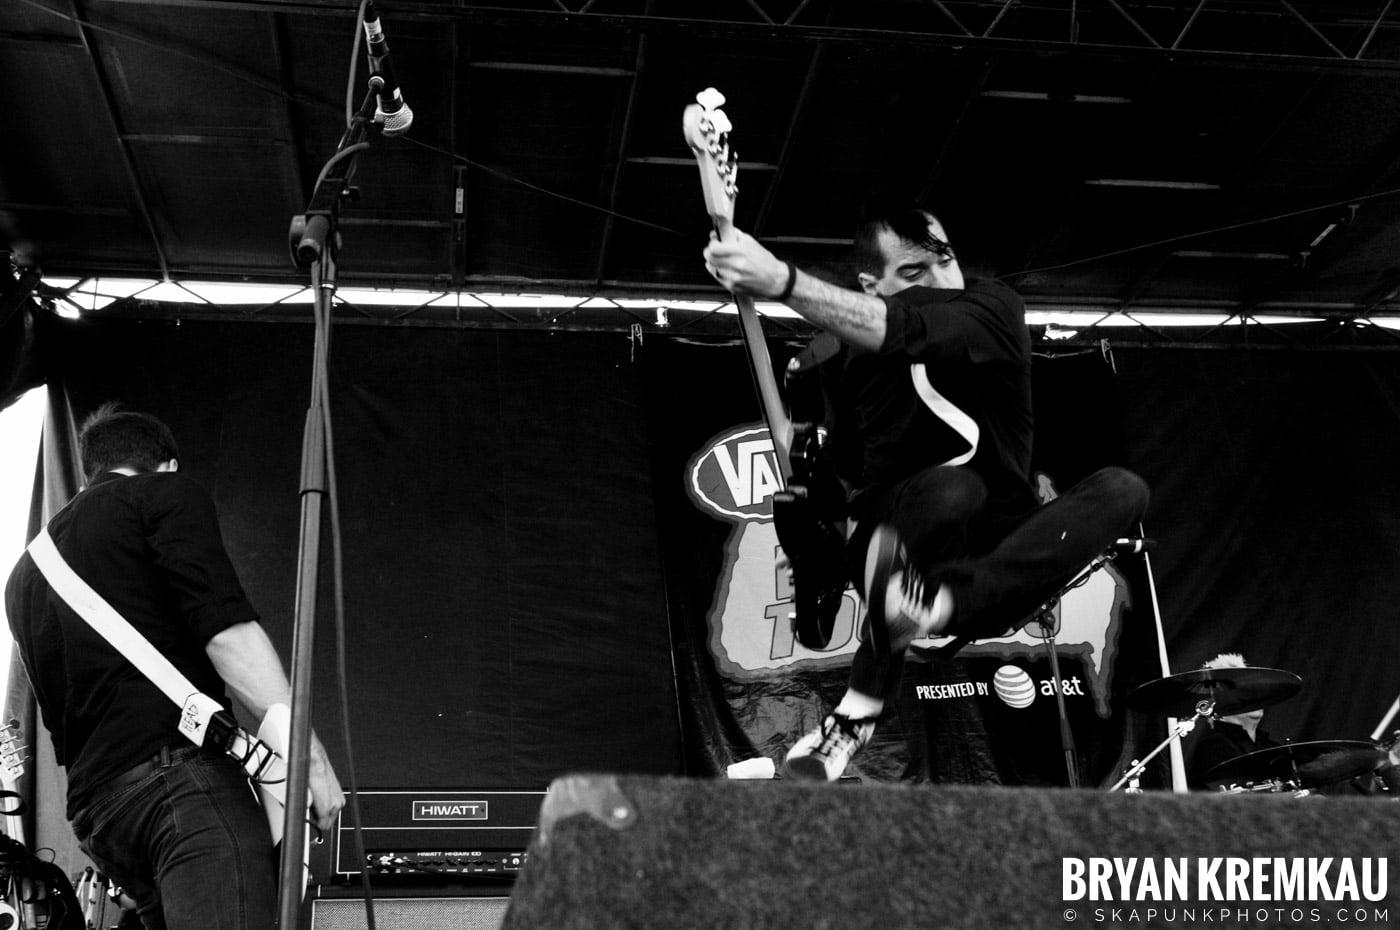 Anti-Flag @ Warped Tour 2009, Scranton PA - 07.15.09 (7)